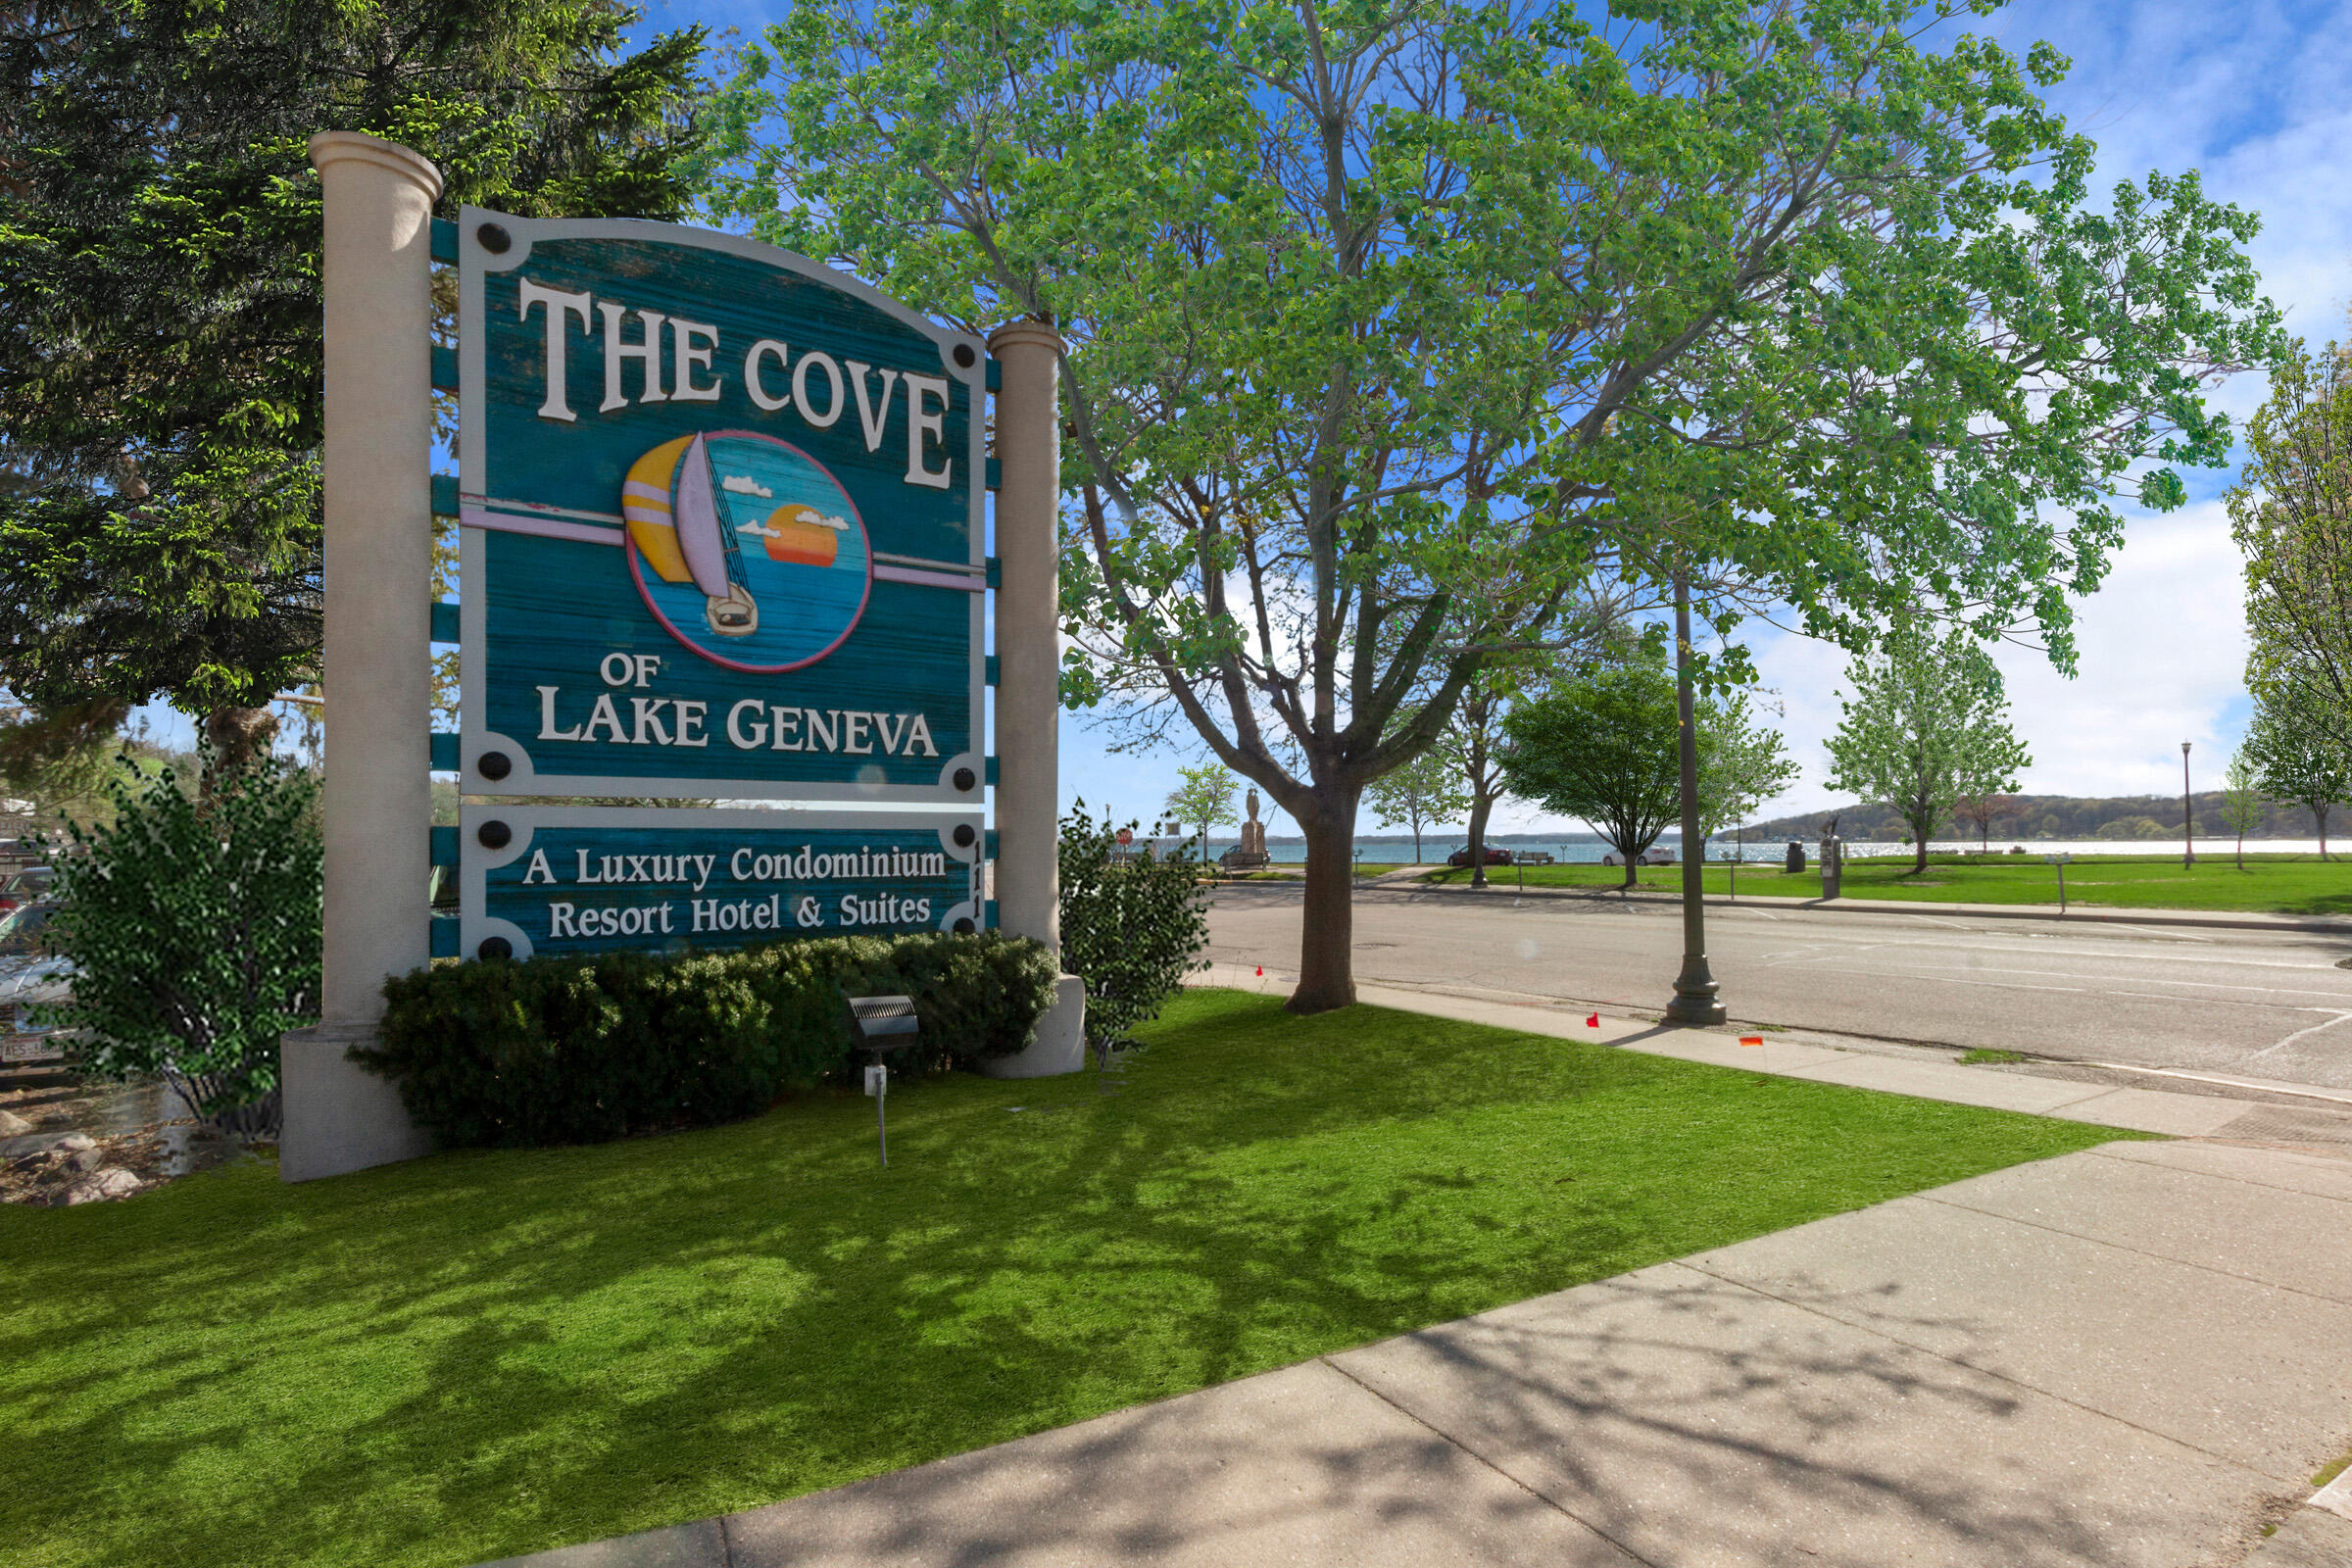 111 Center St, Lake Geneva, Wisconsin 53147, 1 Bedroom Bedrooms, ,1 BathroomBathrooms,Condominiums,For Sale,Center St,2,1754629